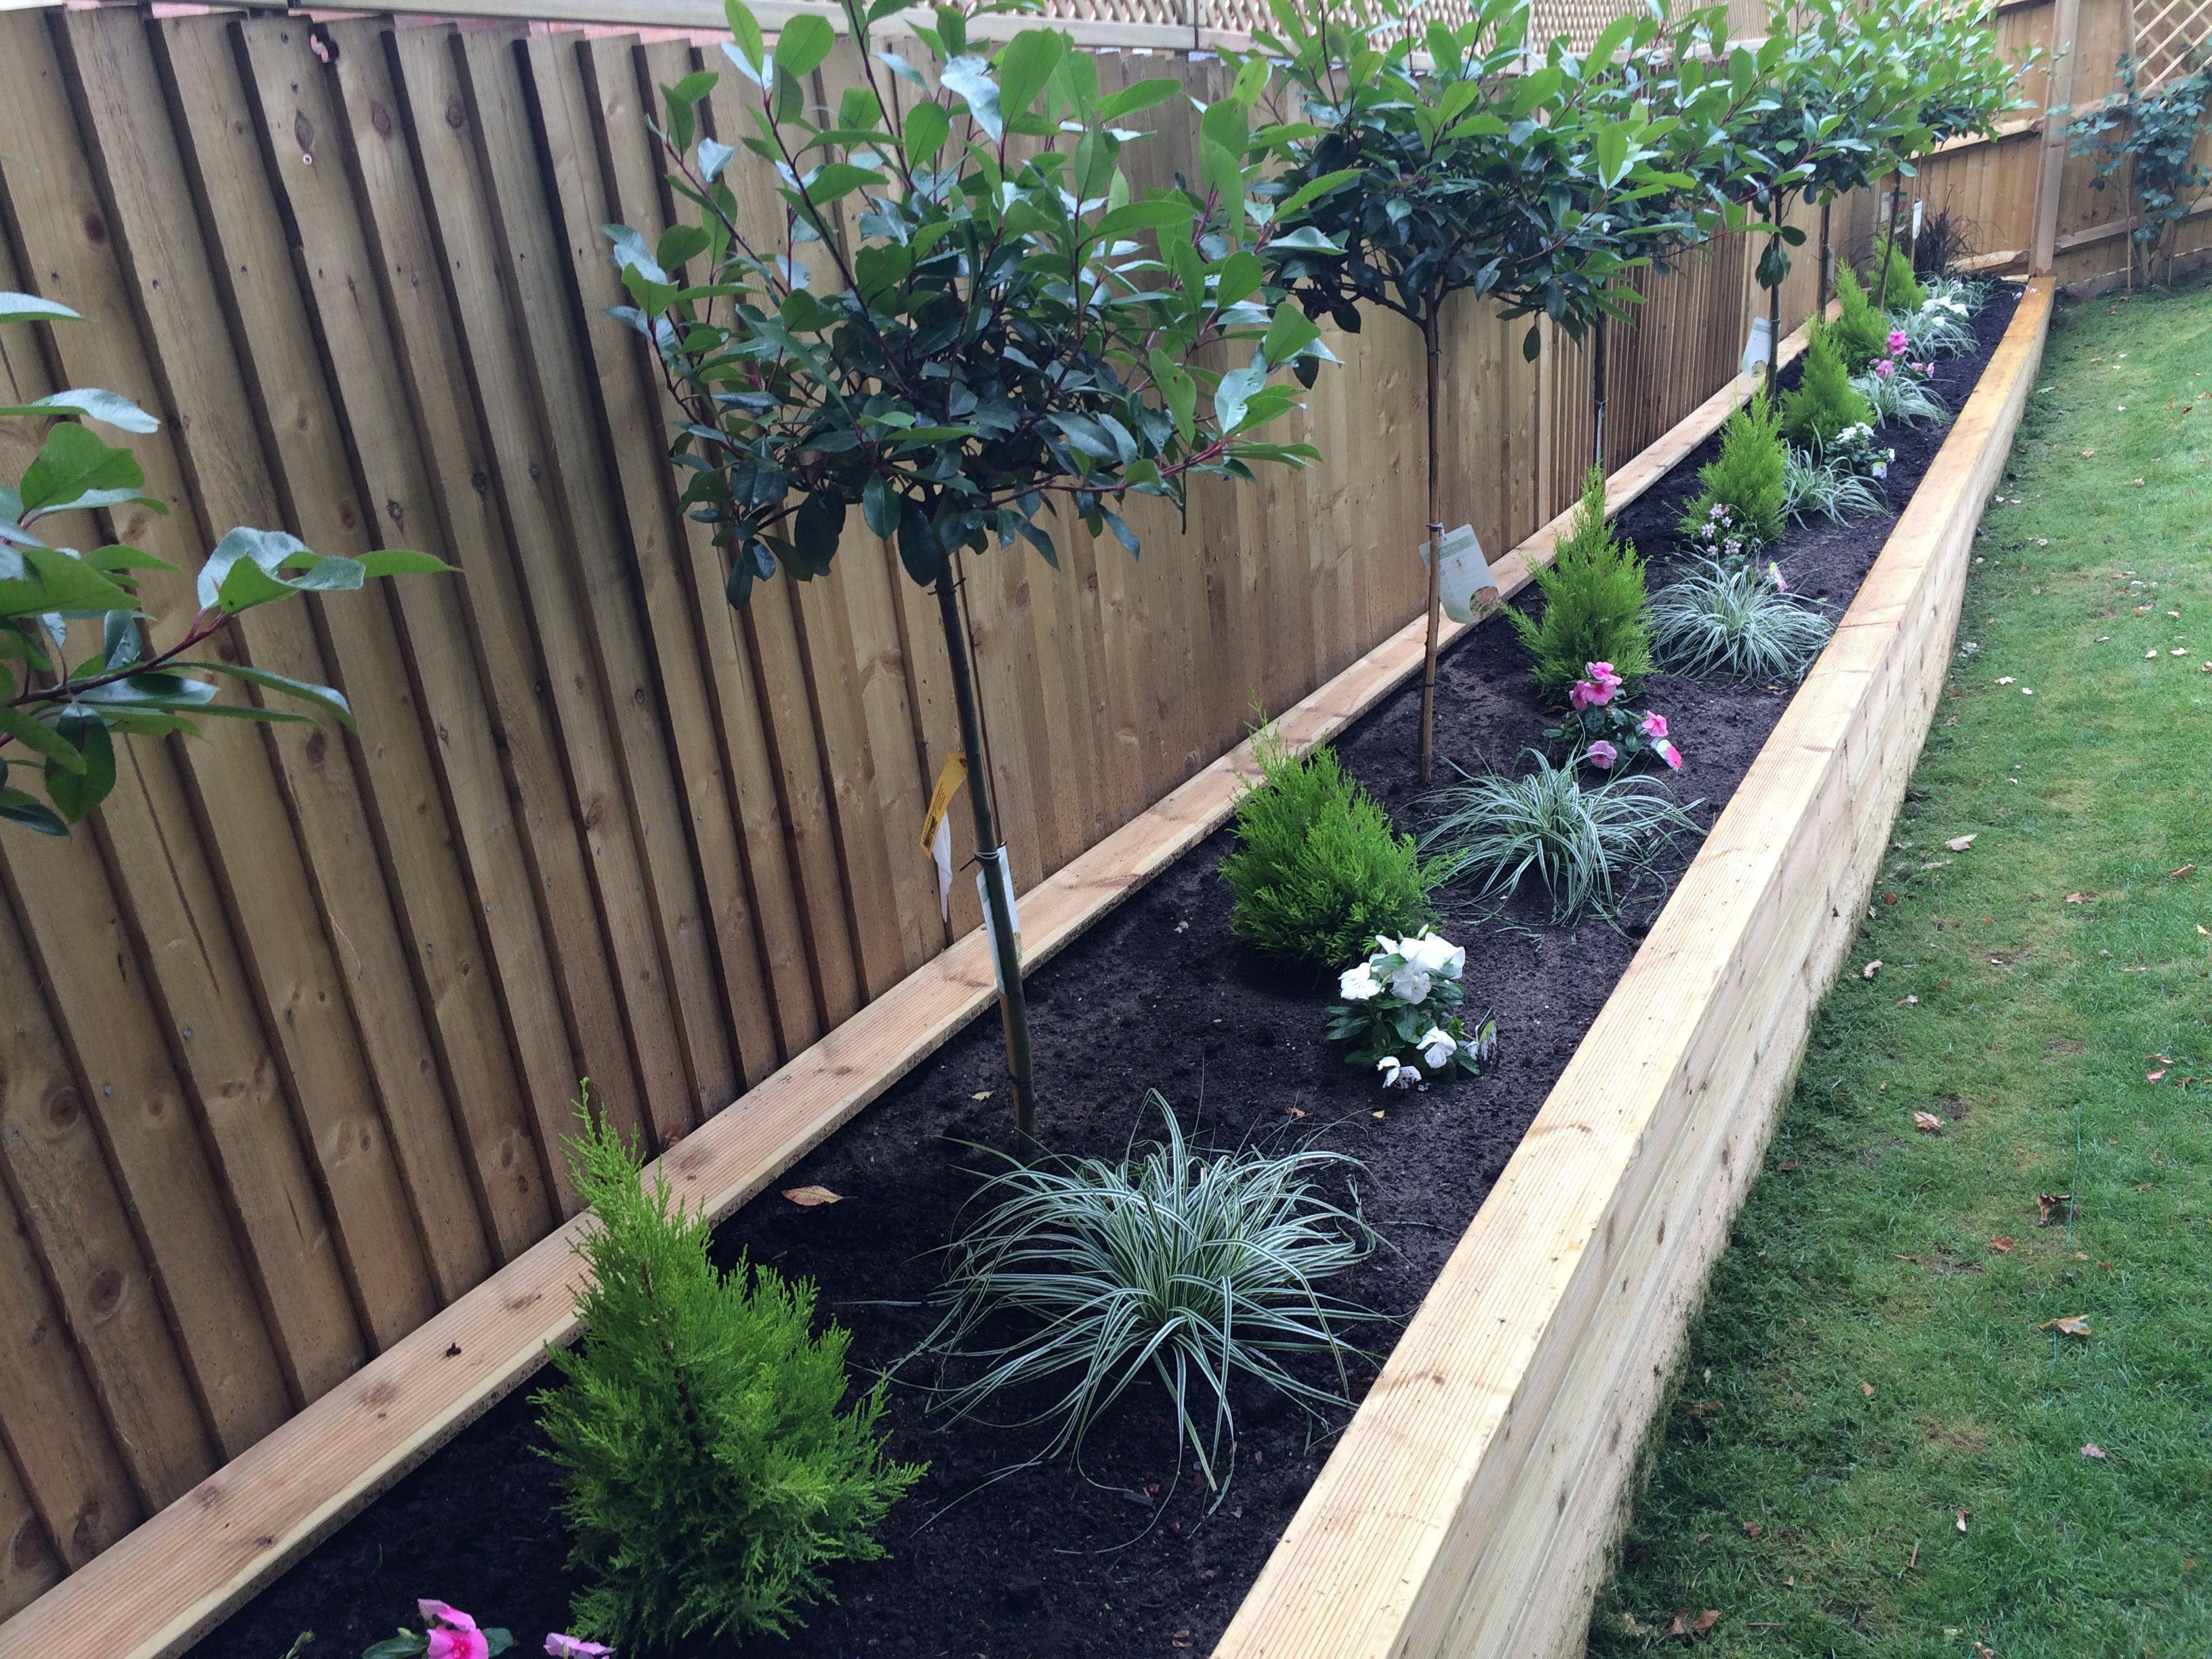 17 Diy Garden Fence Ideas To Keep Your Plants Diy Garden Fence